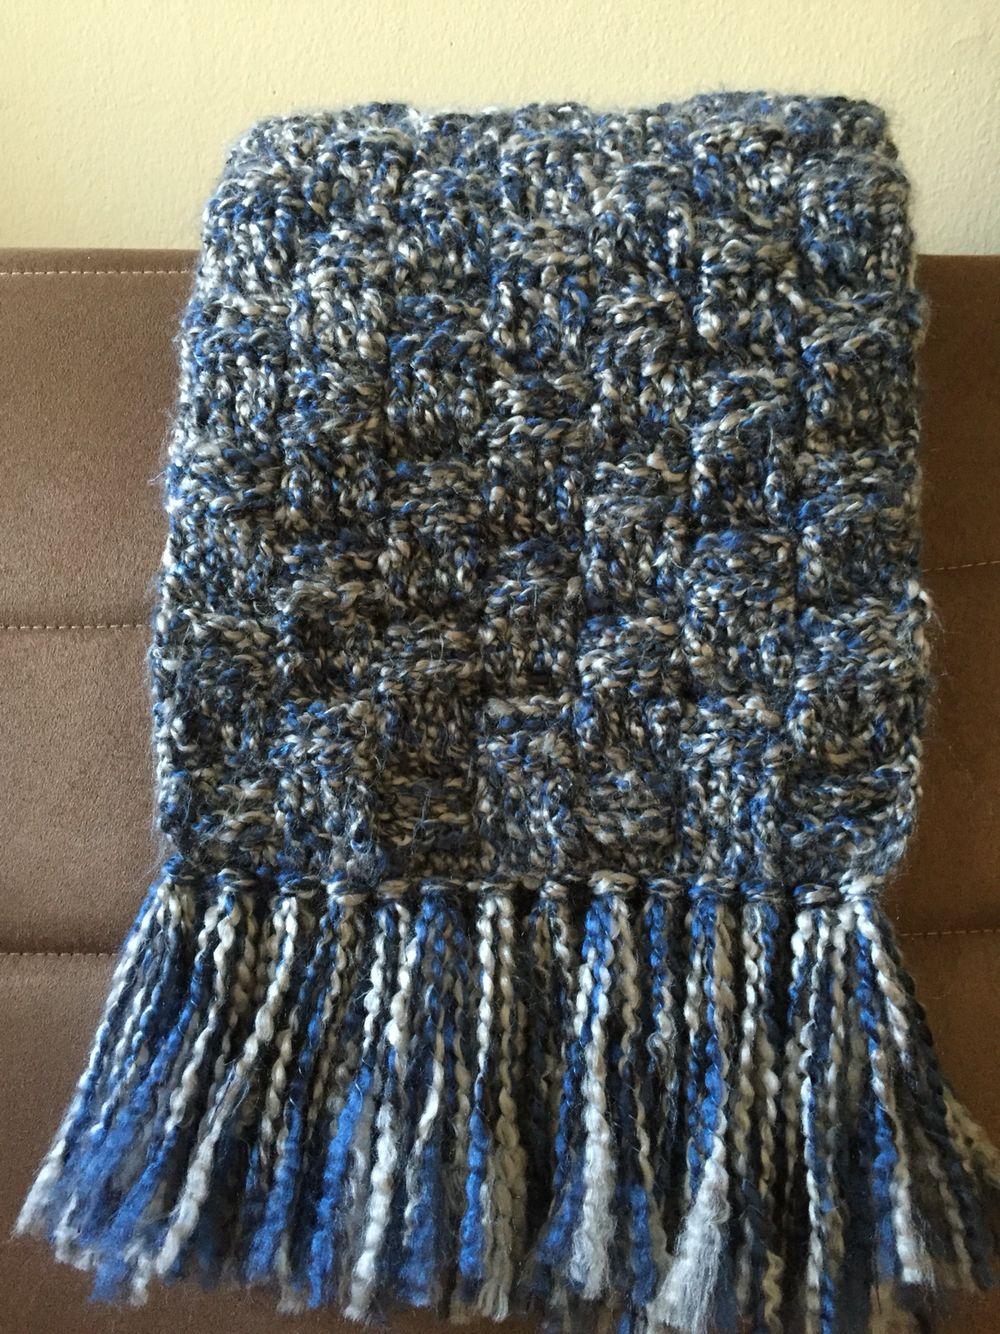 Basket-weave scarf | My Crochet | Pinterest | Woven scarfs and Crochet